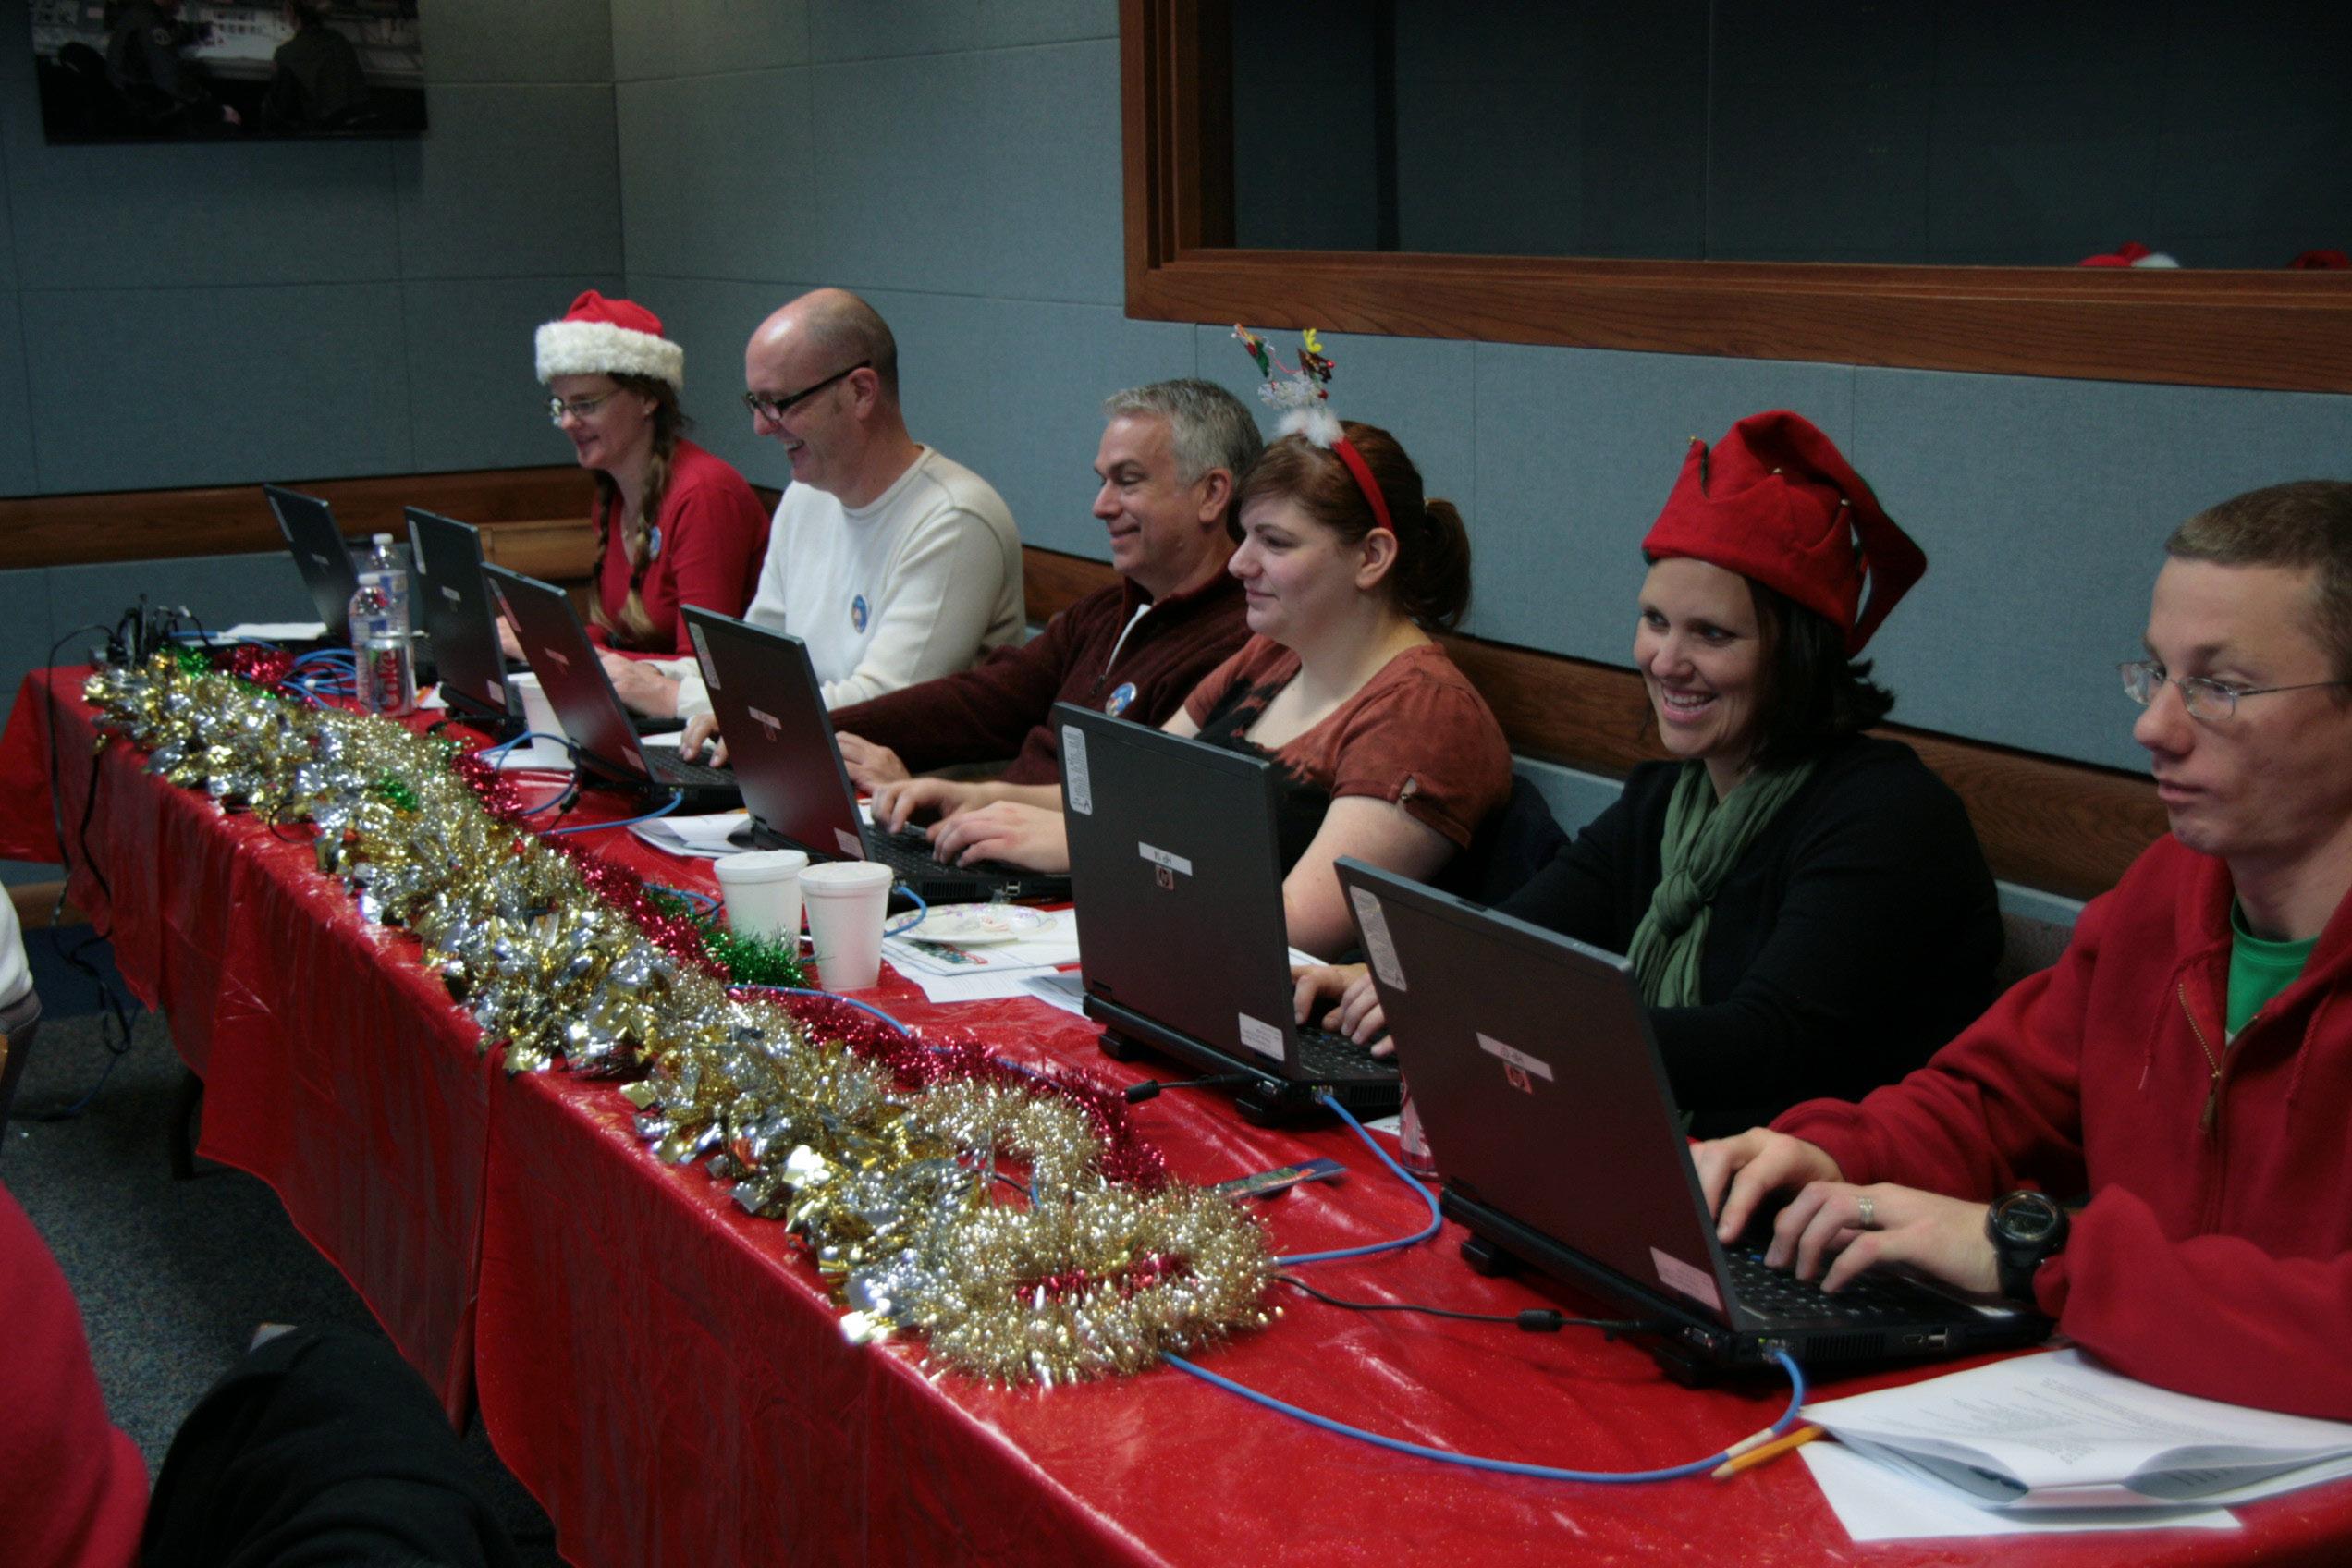 File:NORAD tracks Santa DVIDS234566.jpg - Wikimedia Commons